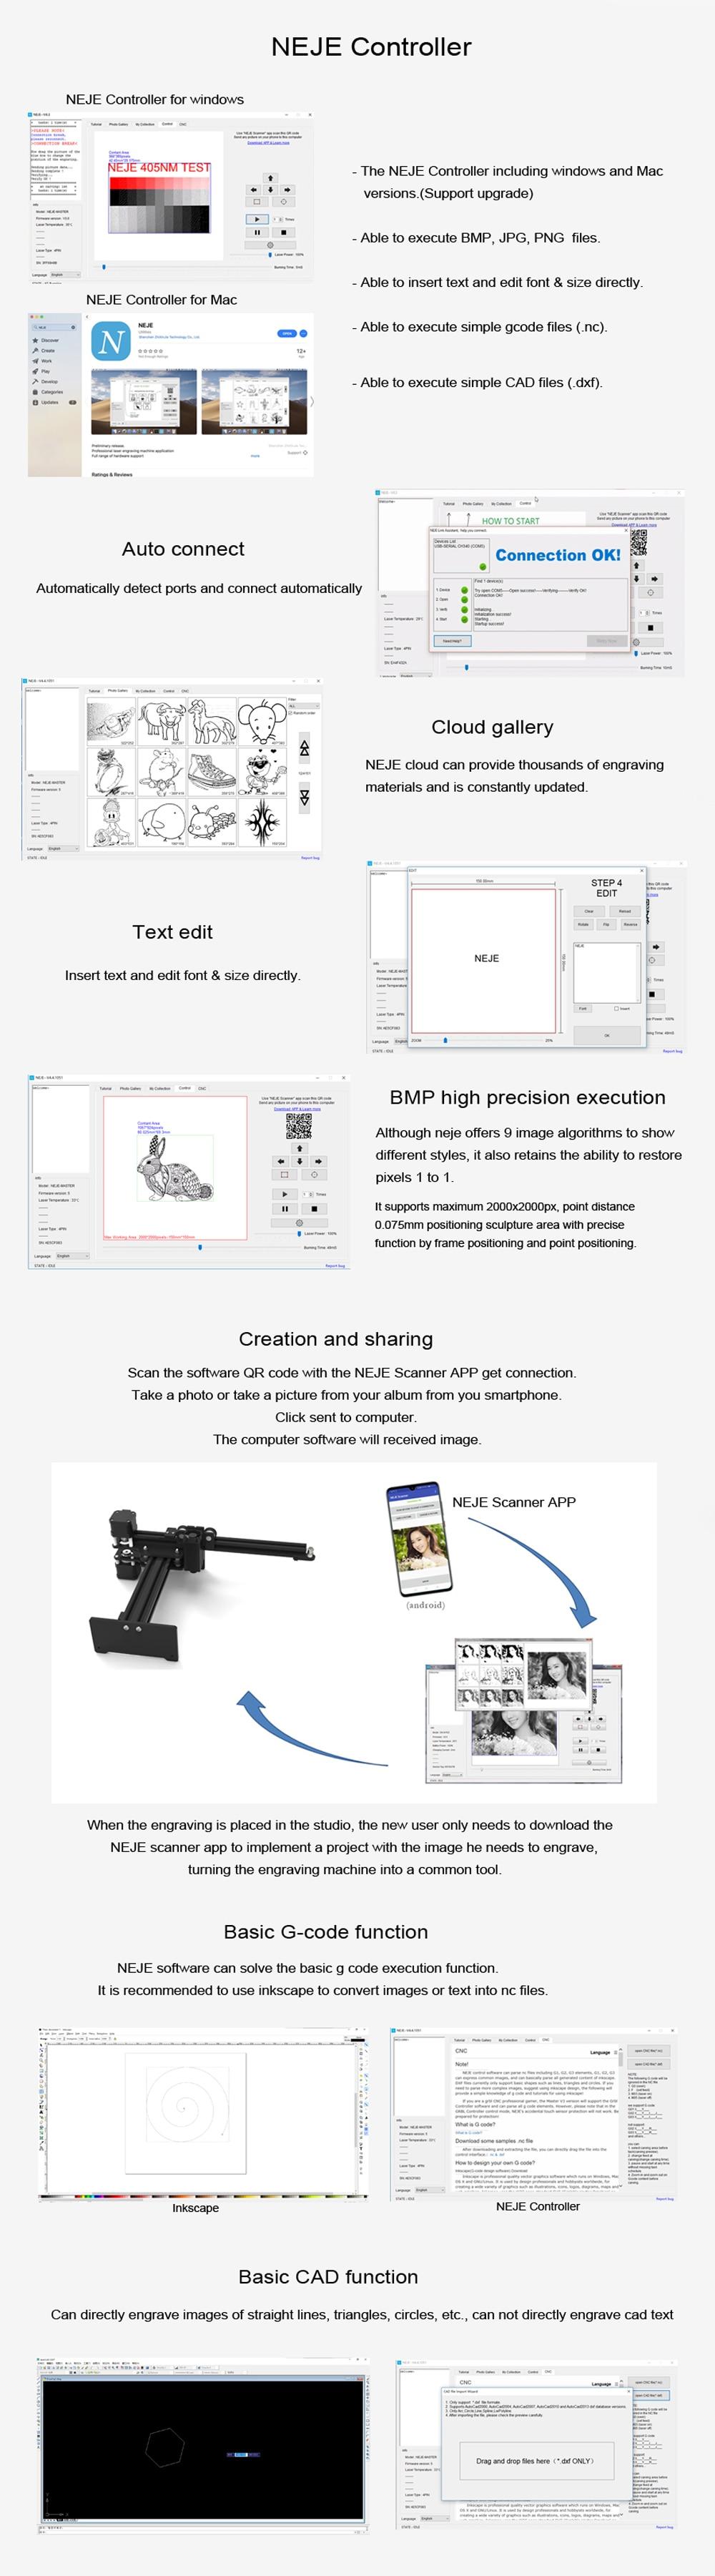 NEJE Master CNC Laser Engraver/Laser Engraving Machine for Metal Engraving